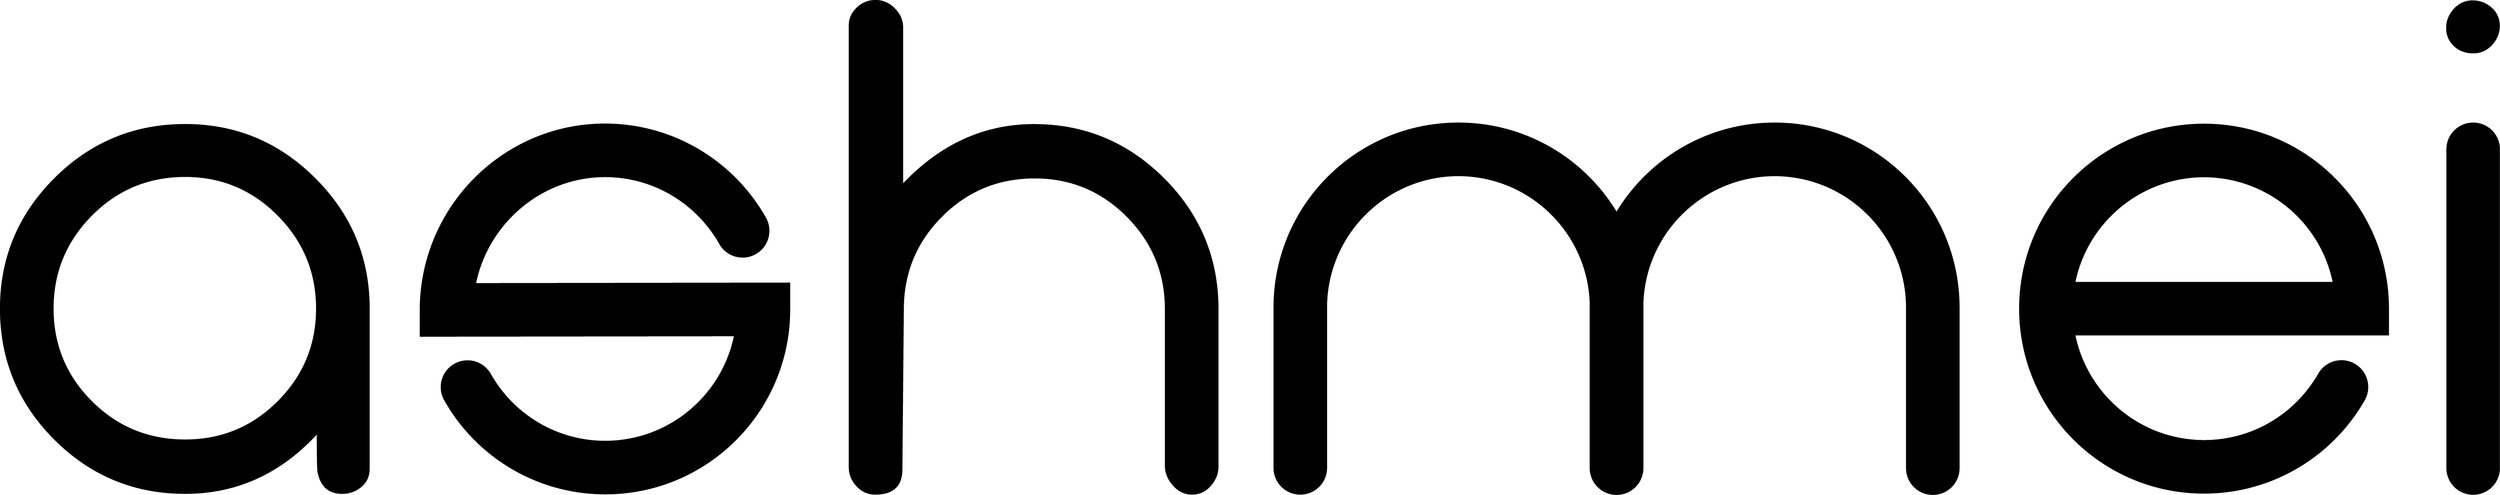 ashmei logo.jpg